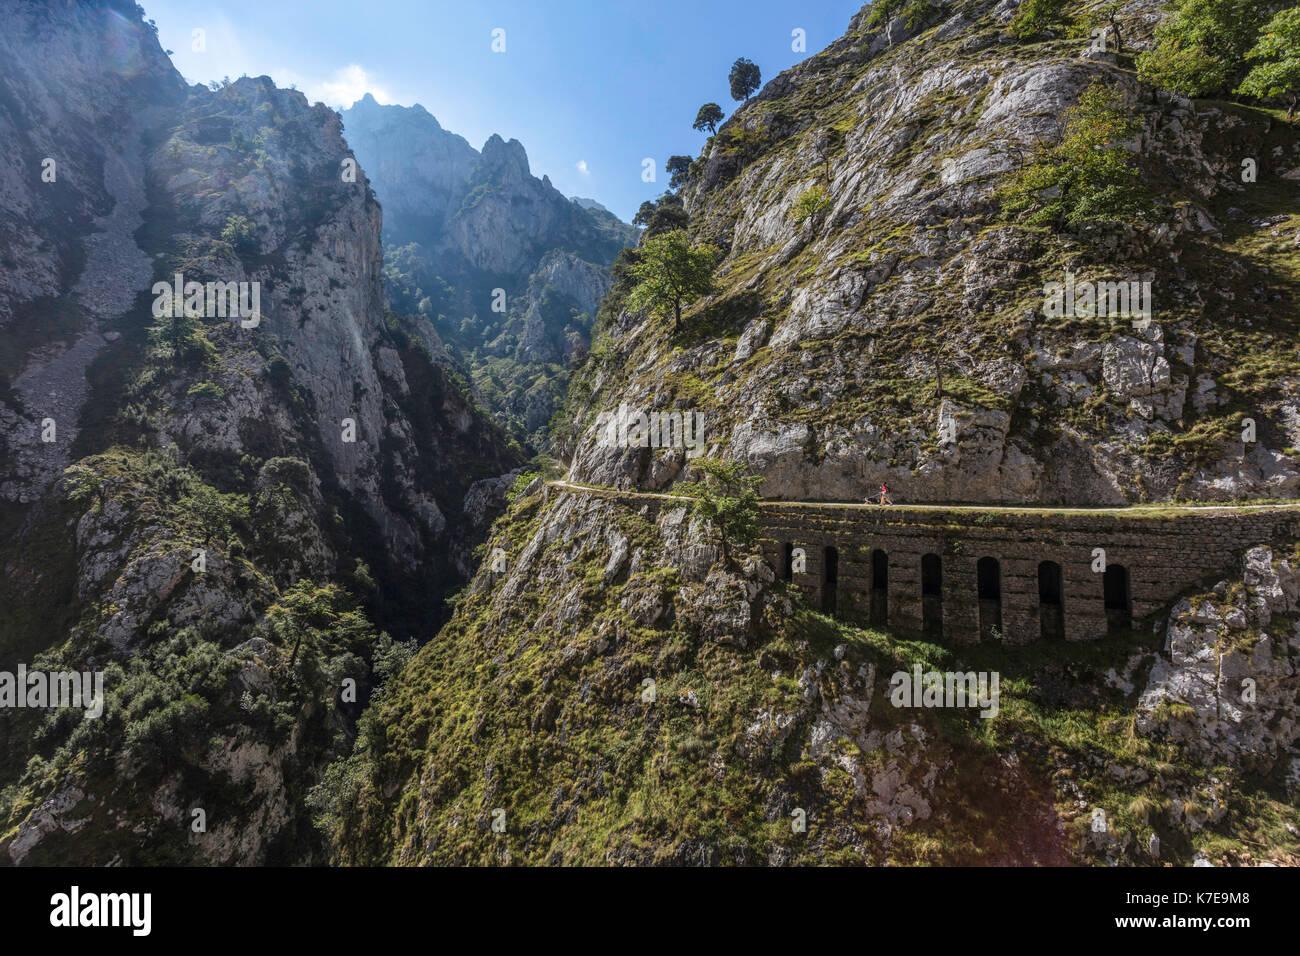 Ruta del Cares view. Picos de Europa, Spain - Stock Image